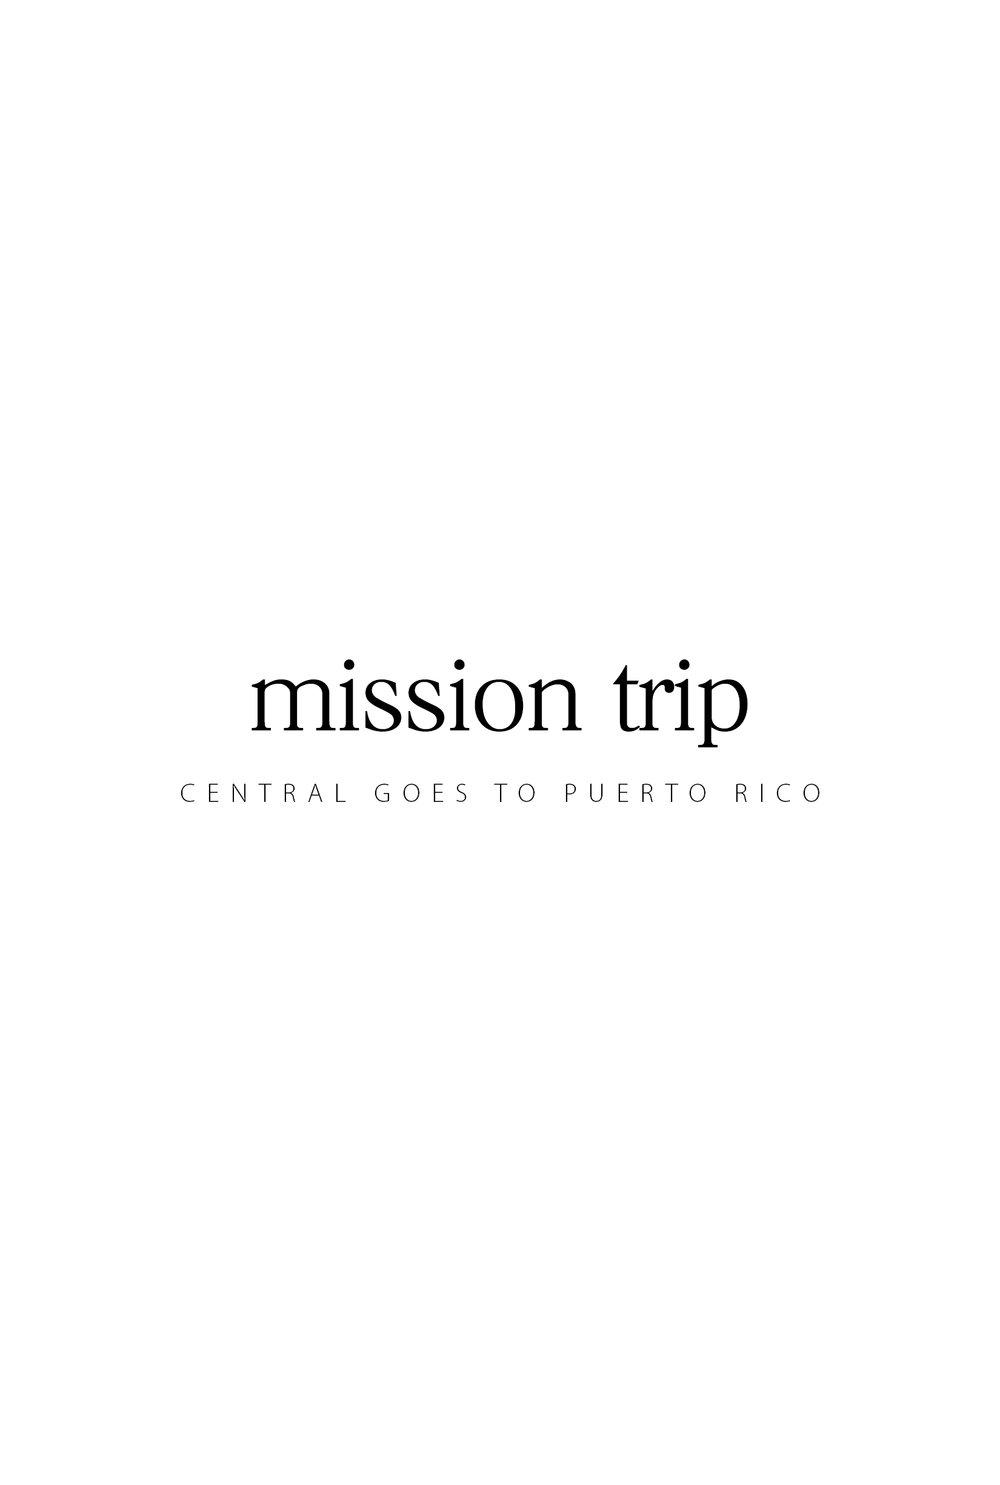 mission trip.jpg